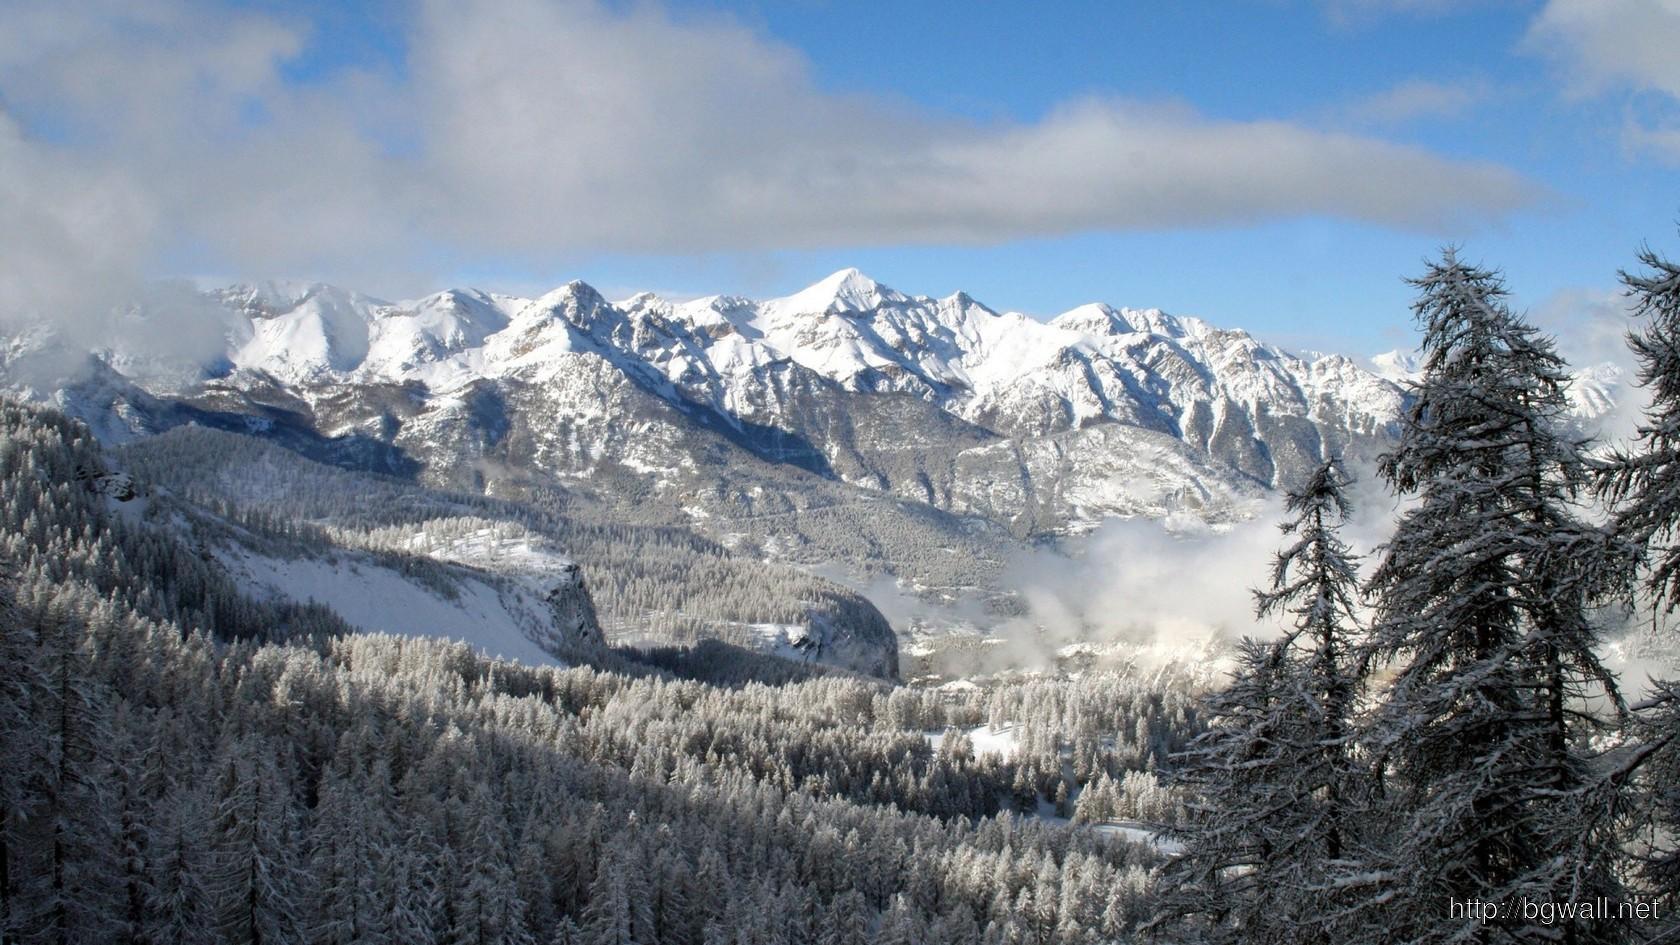 Snowy Mountains Wallpaper 3365